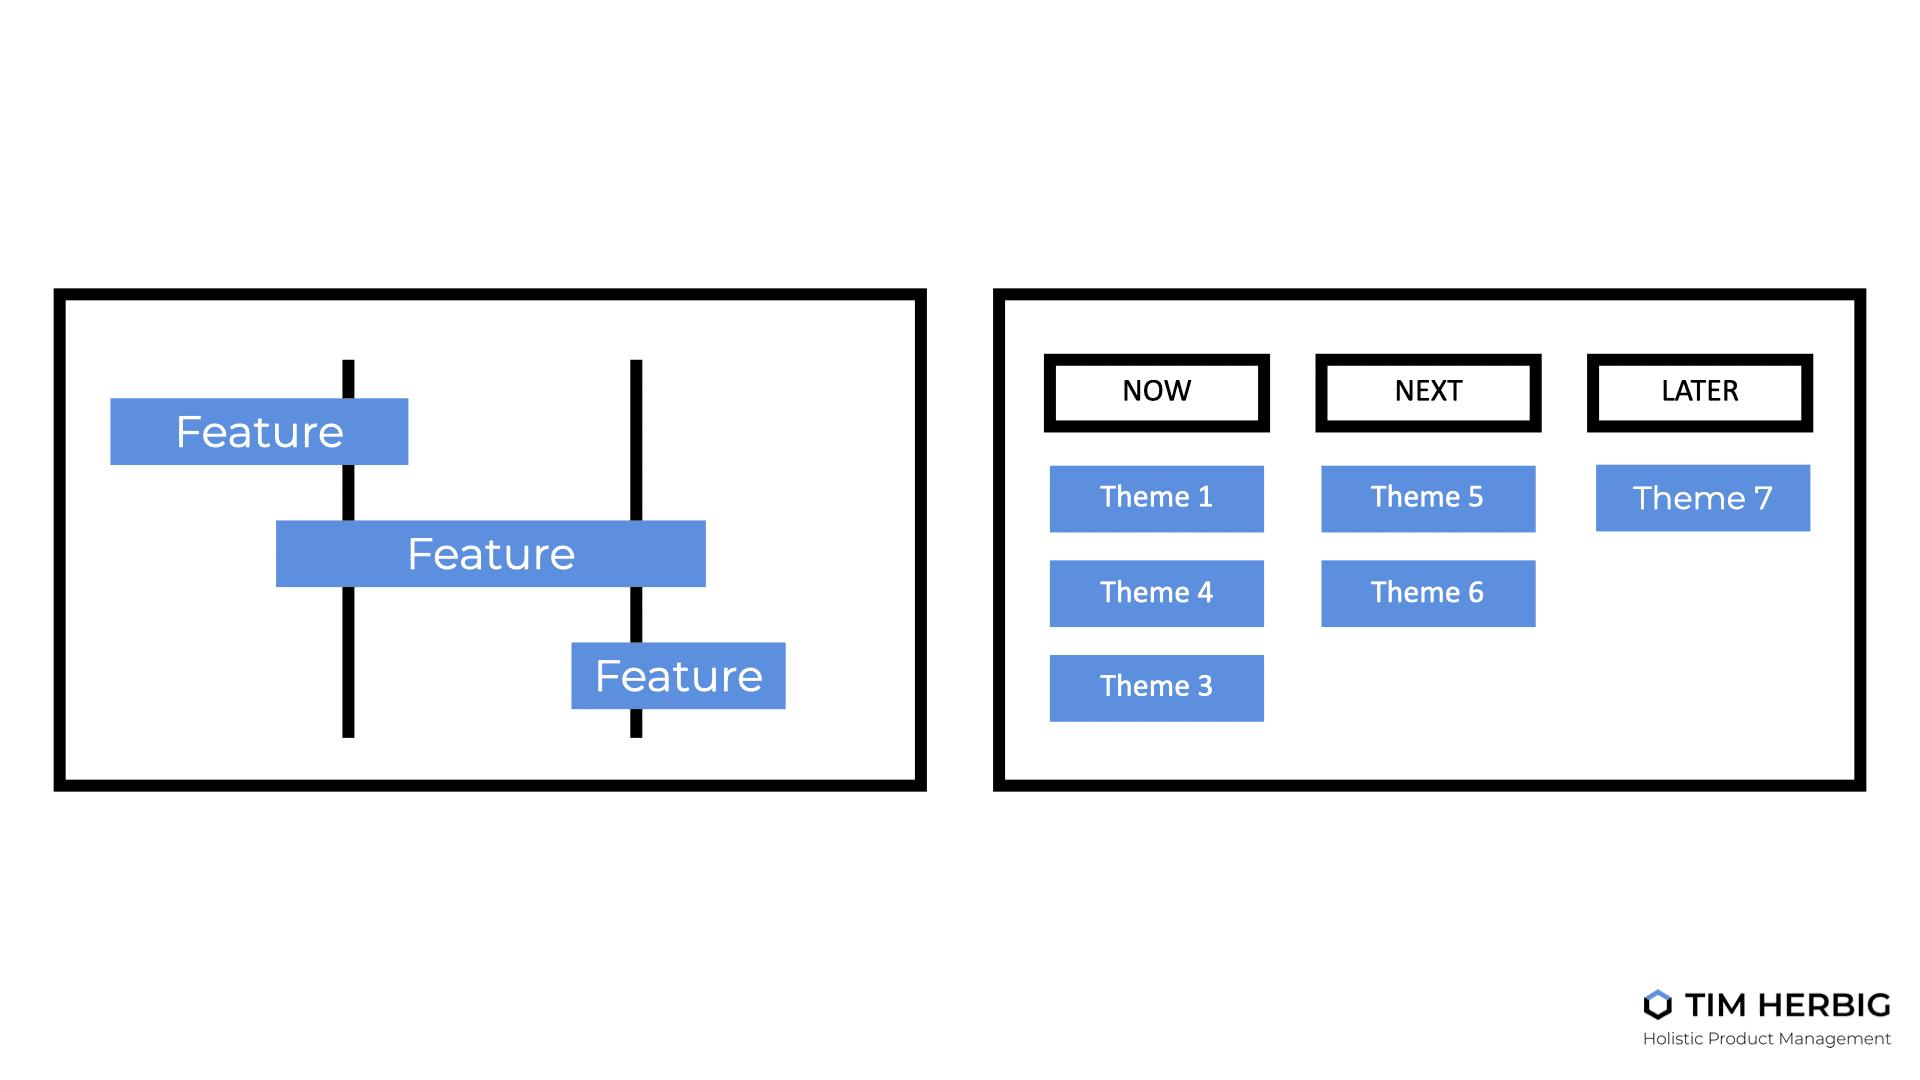 Theme-based Roadmaps